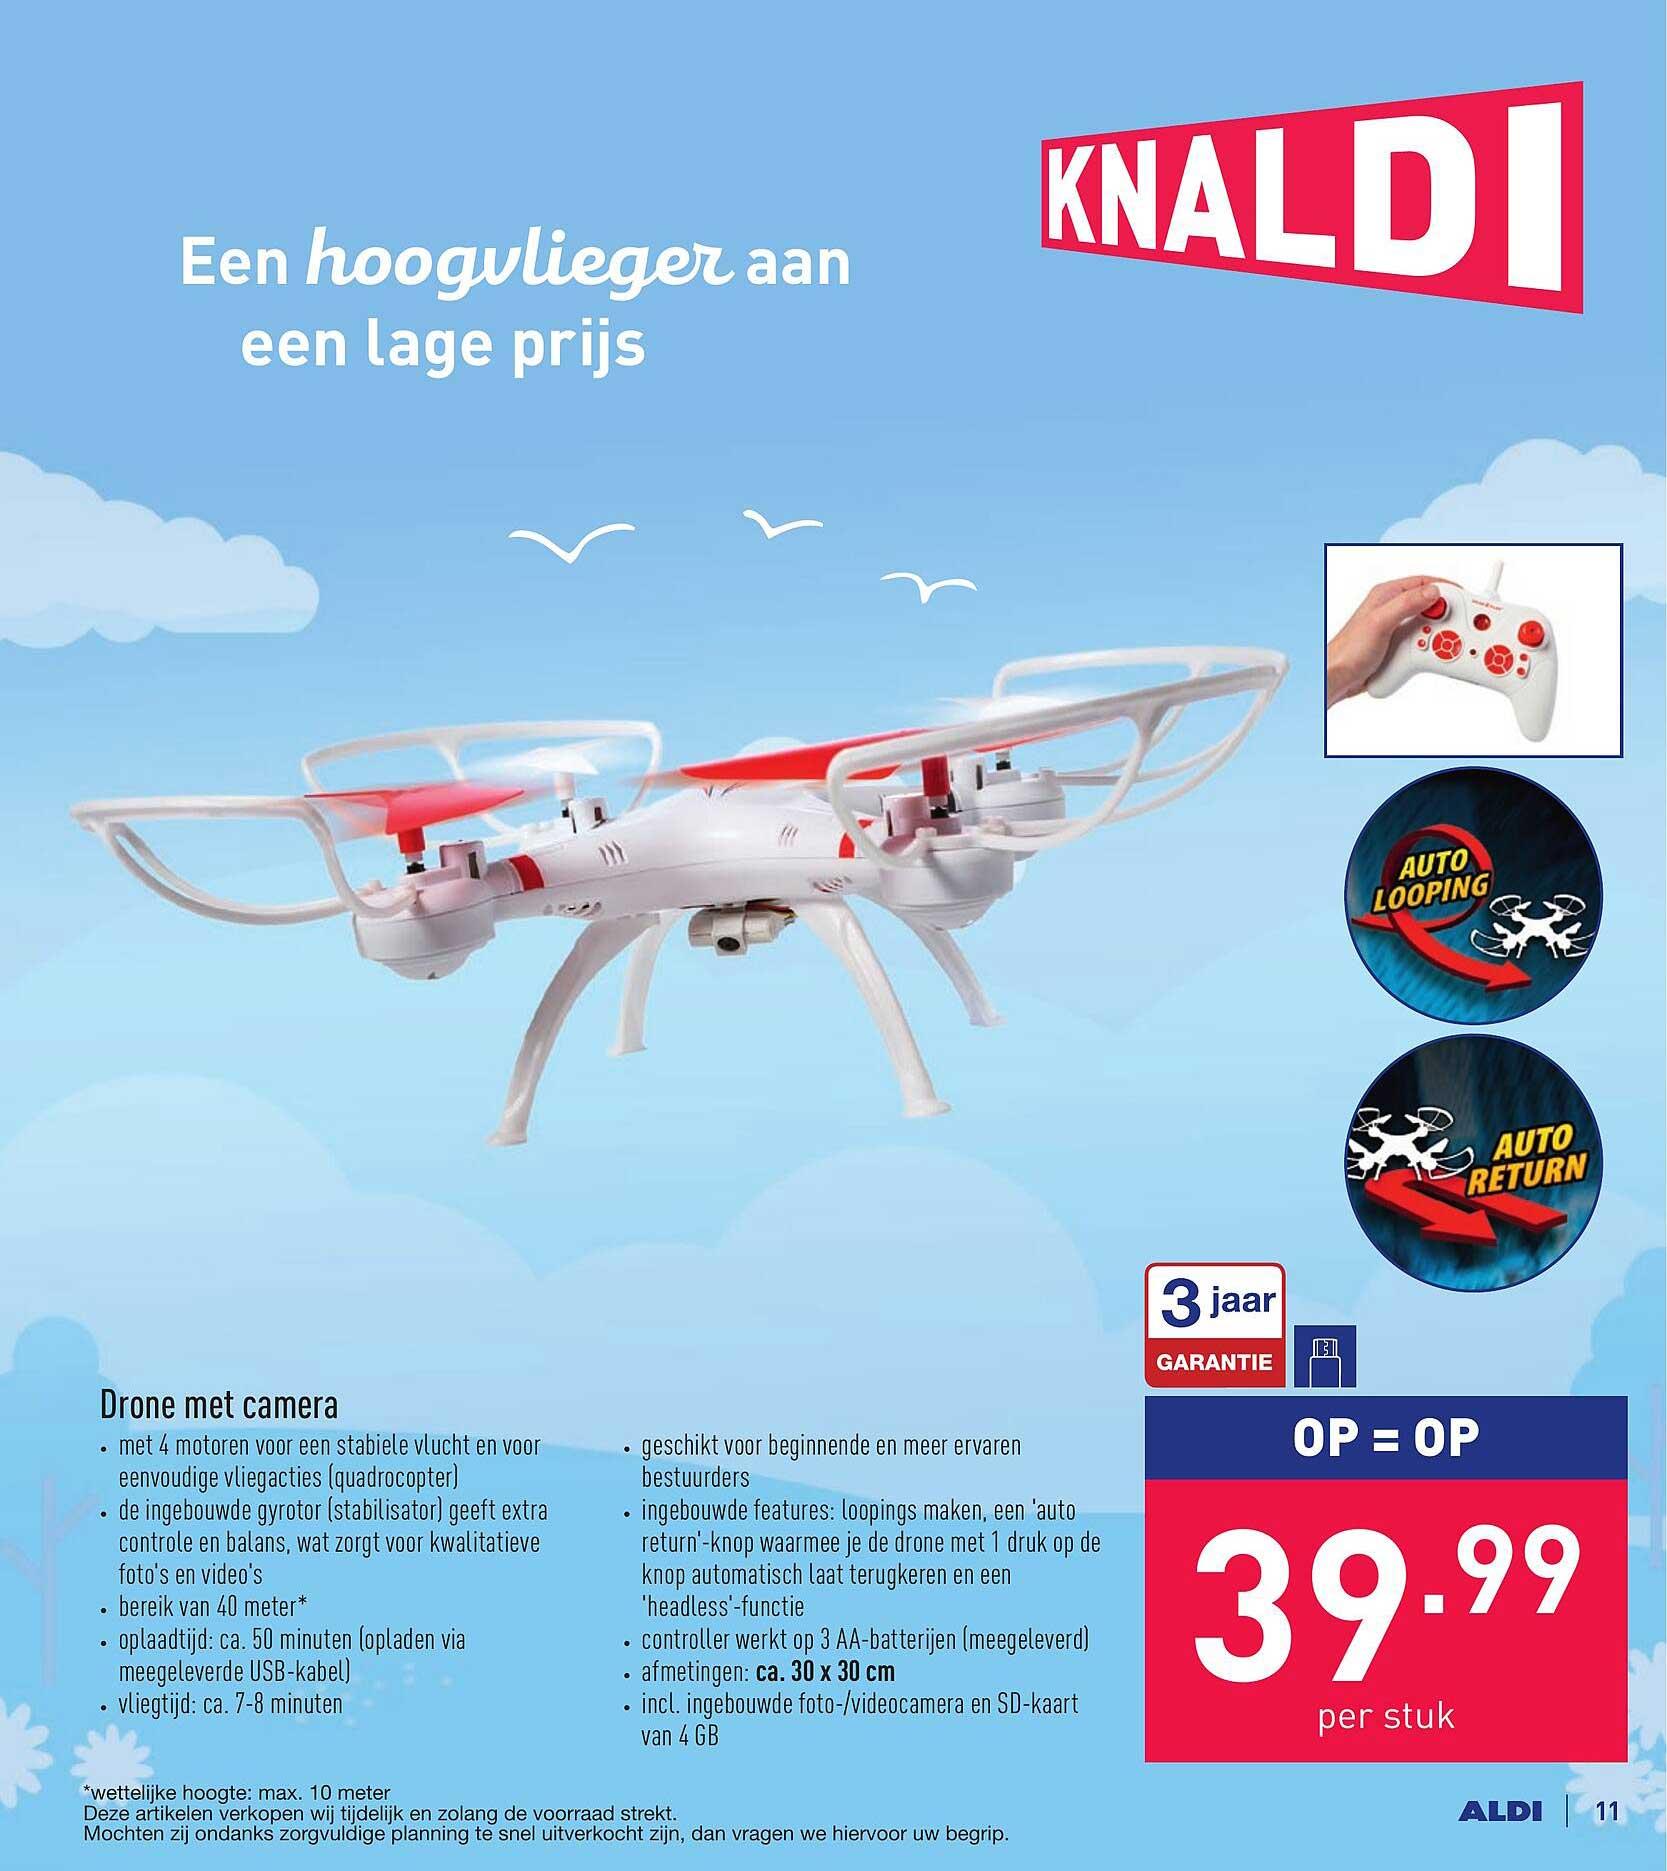 ALDI Drone Met Camera